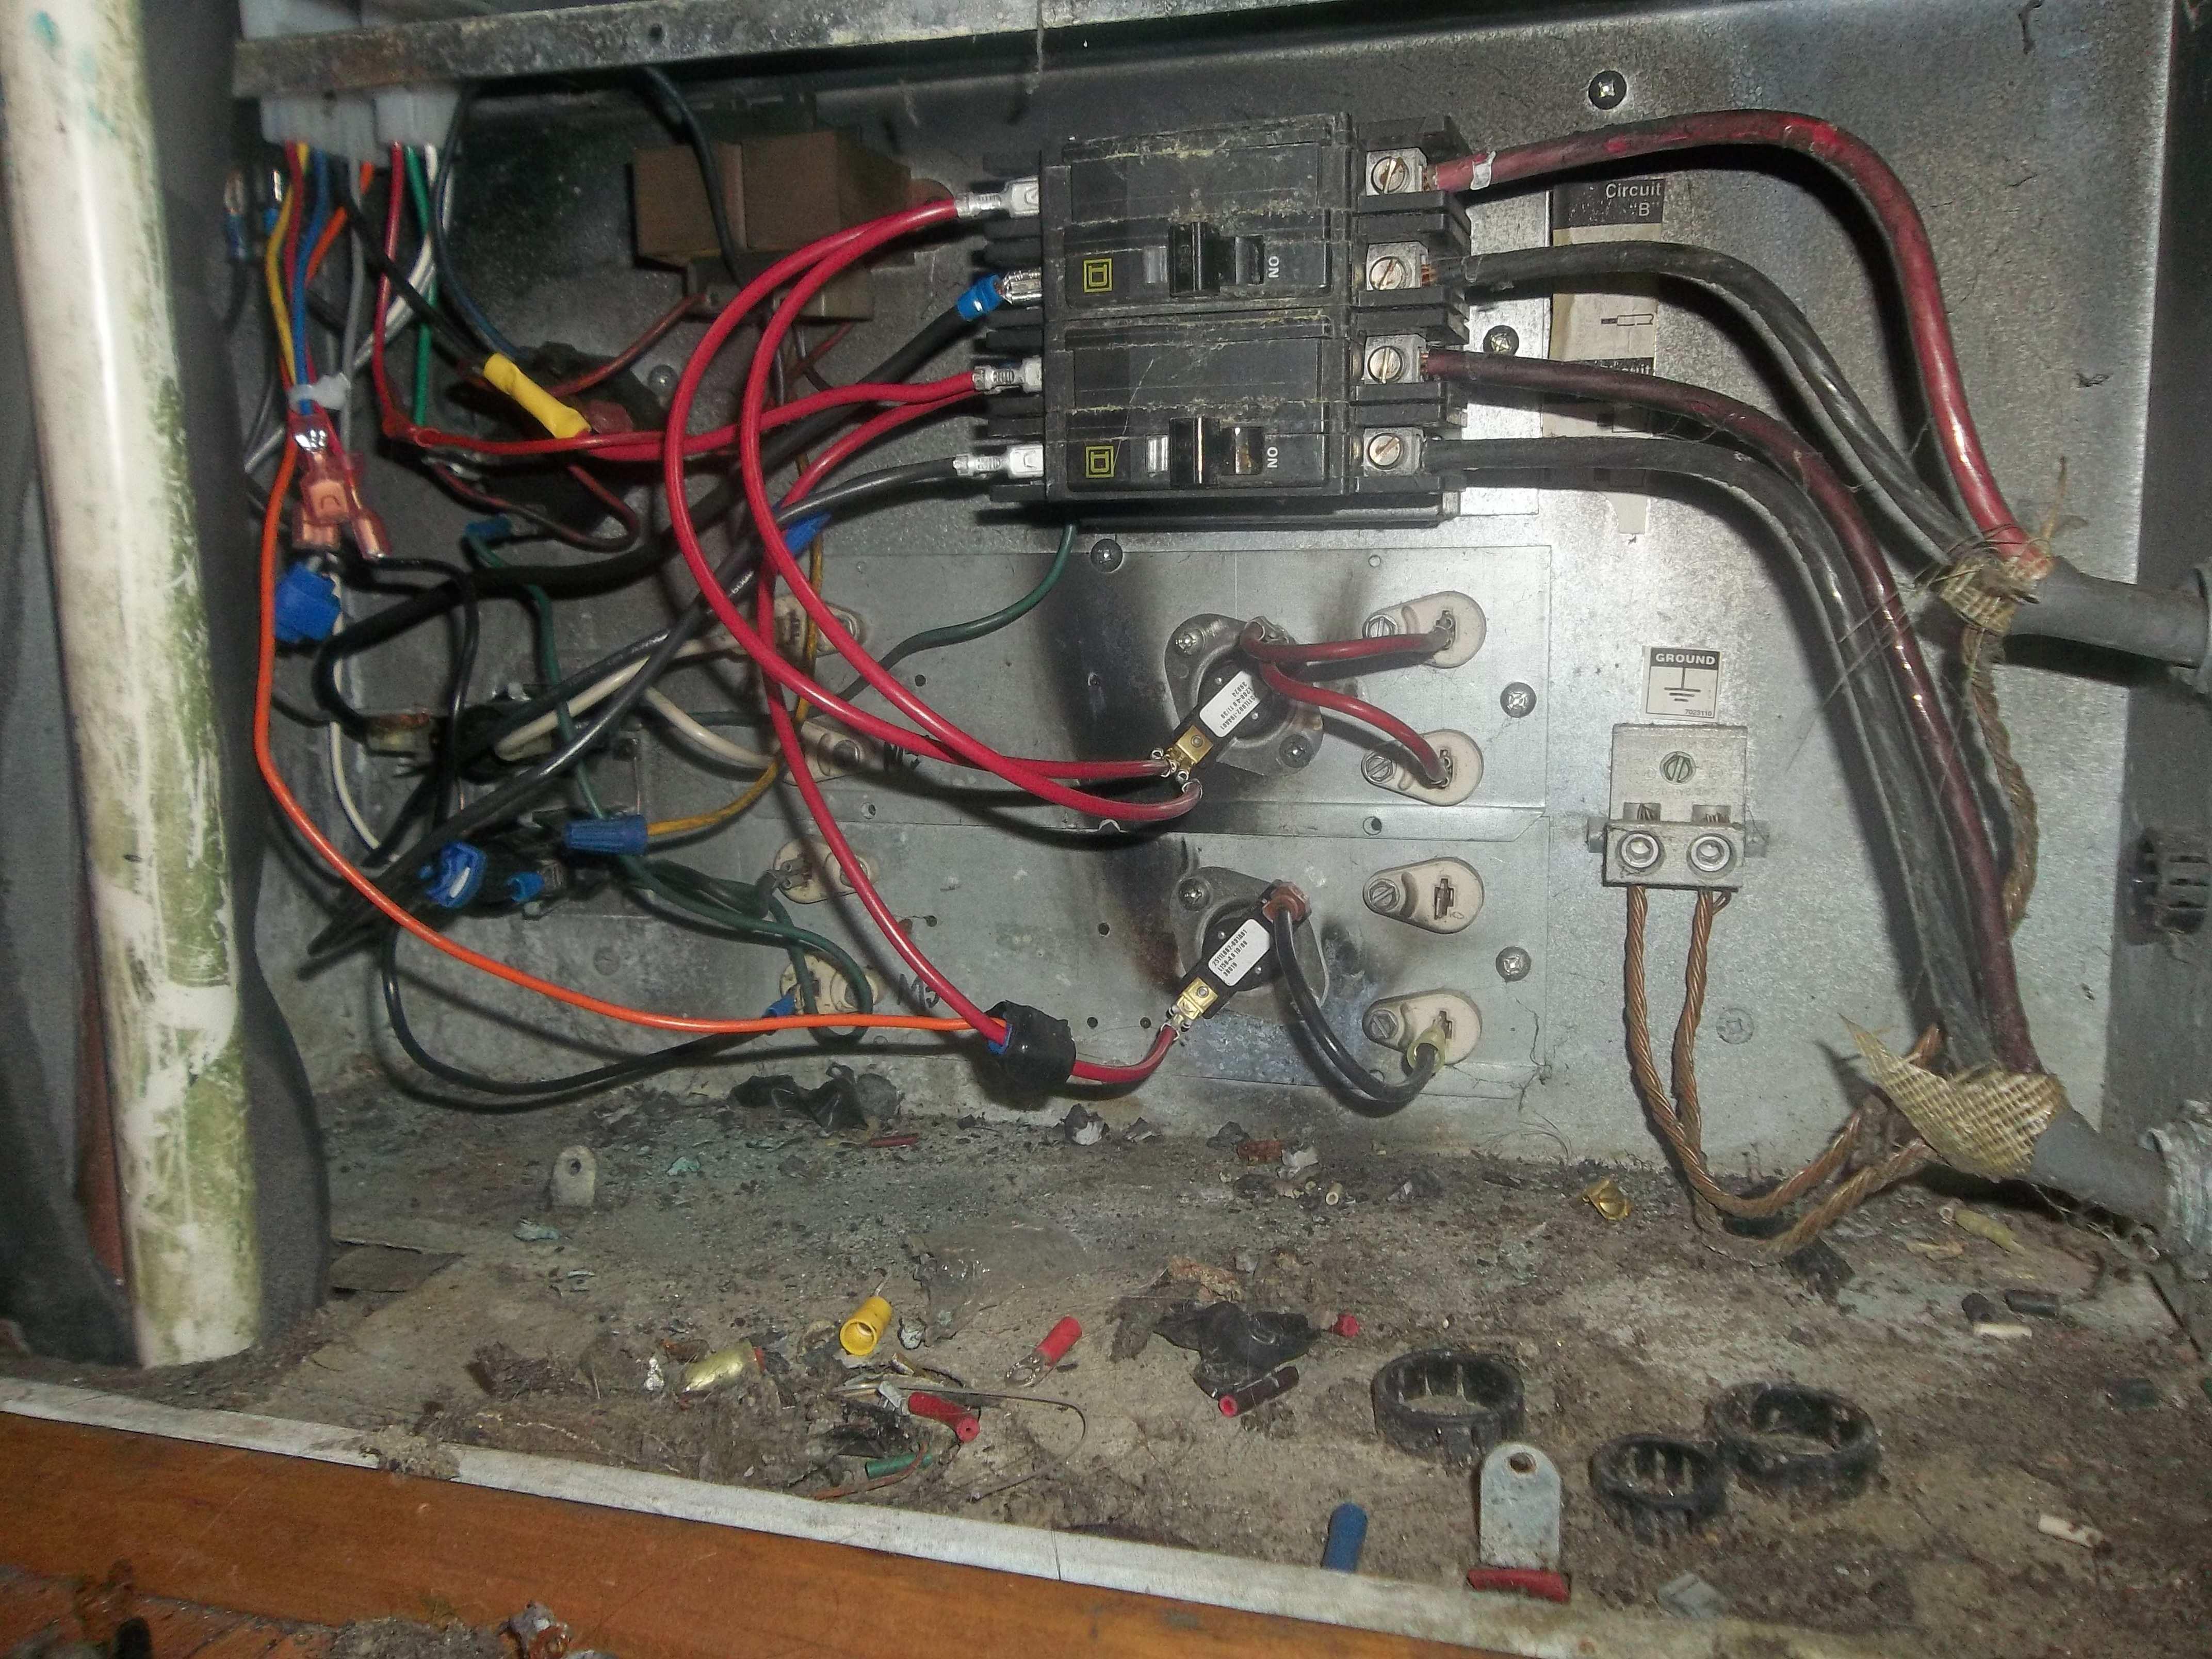 Wiring Diagram Intertherm Electric Furnace Wiring Diagram Coleman - Coleman Mobile Home Electric Furnace Wiring Diagram